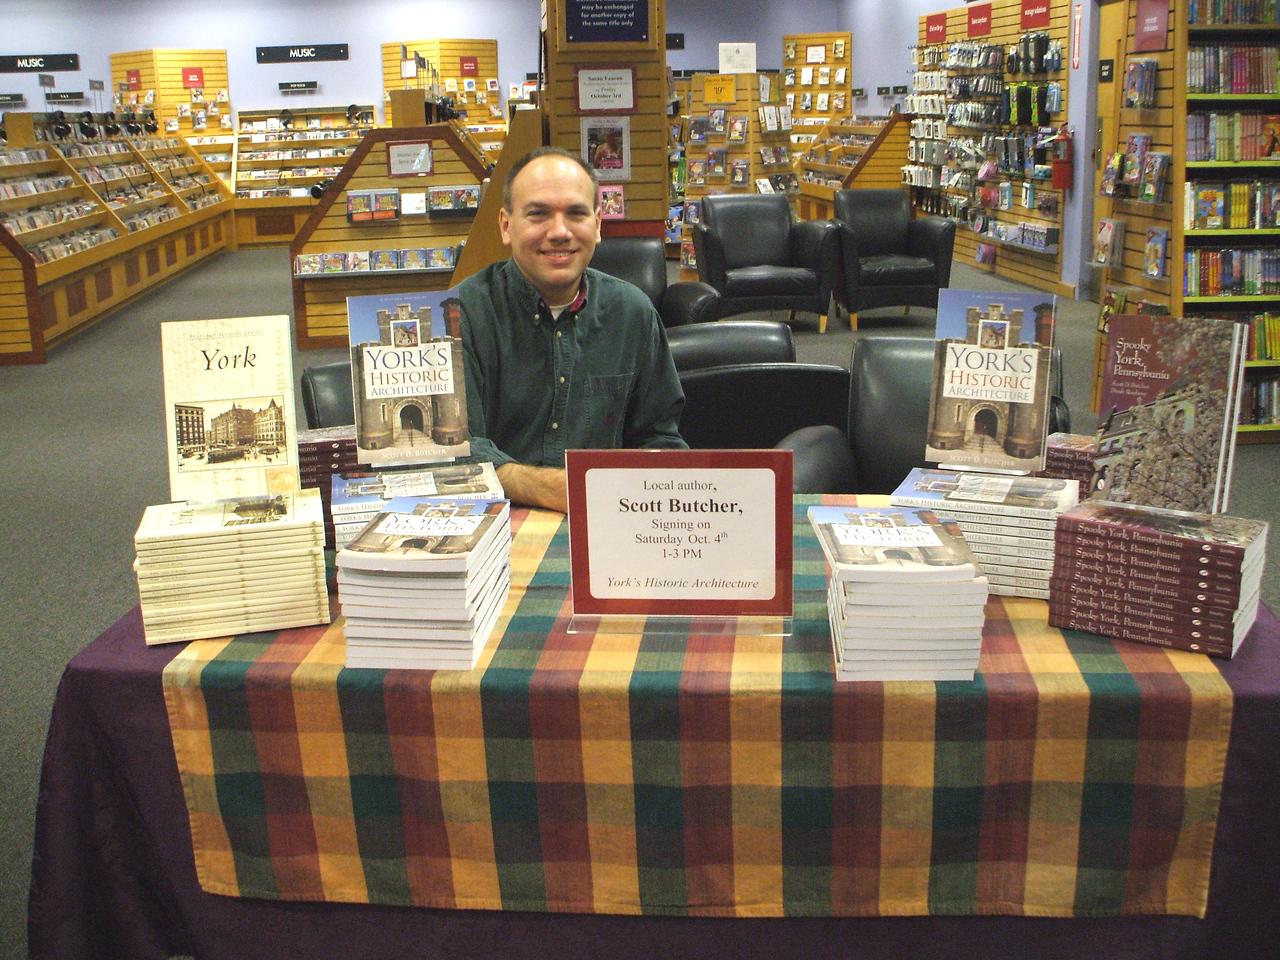 Scott D. Butcher - Book Signing - Horizontal